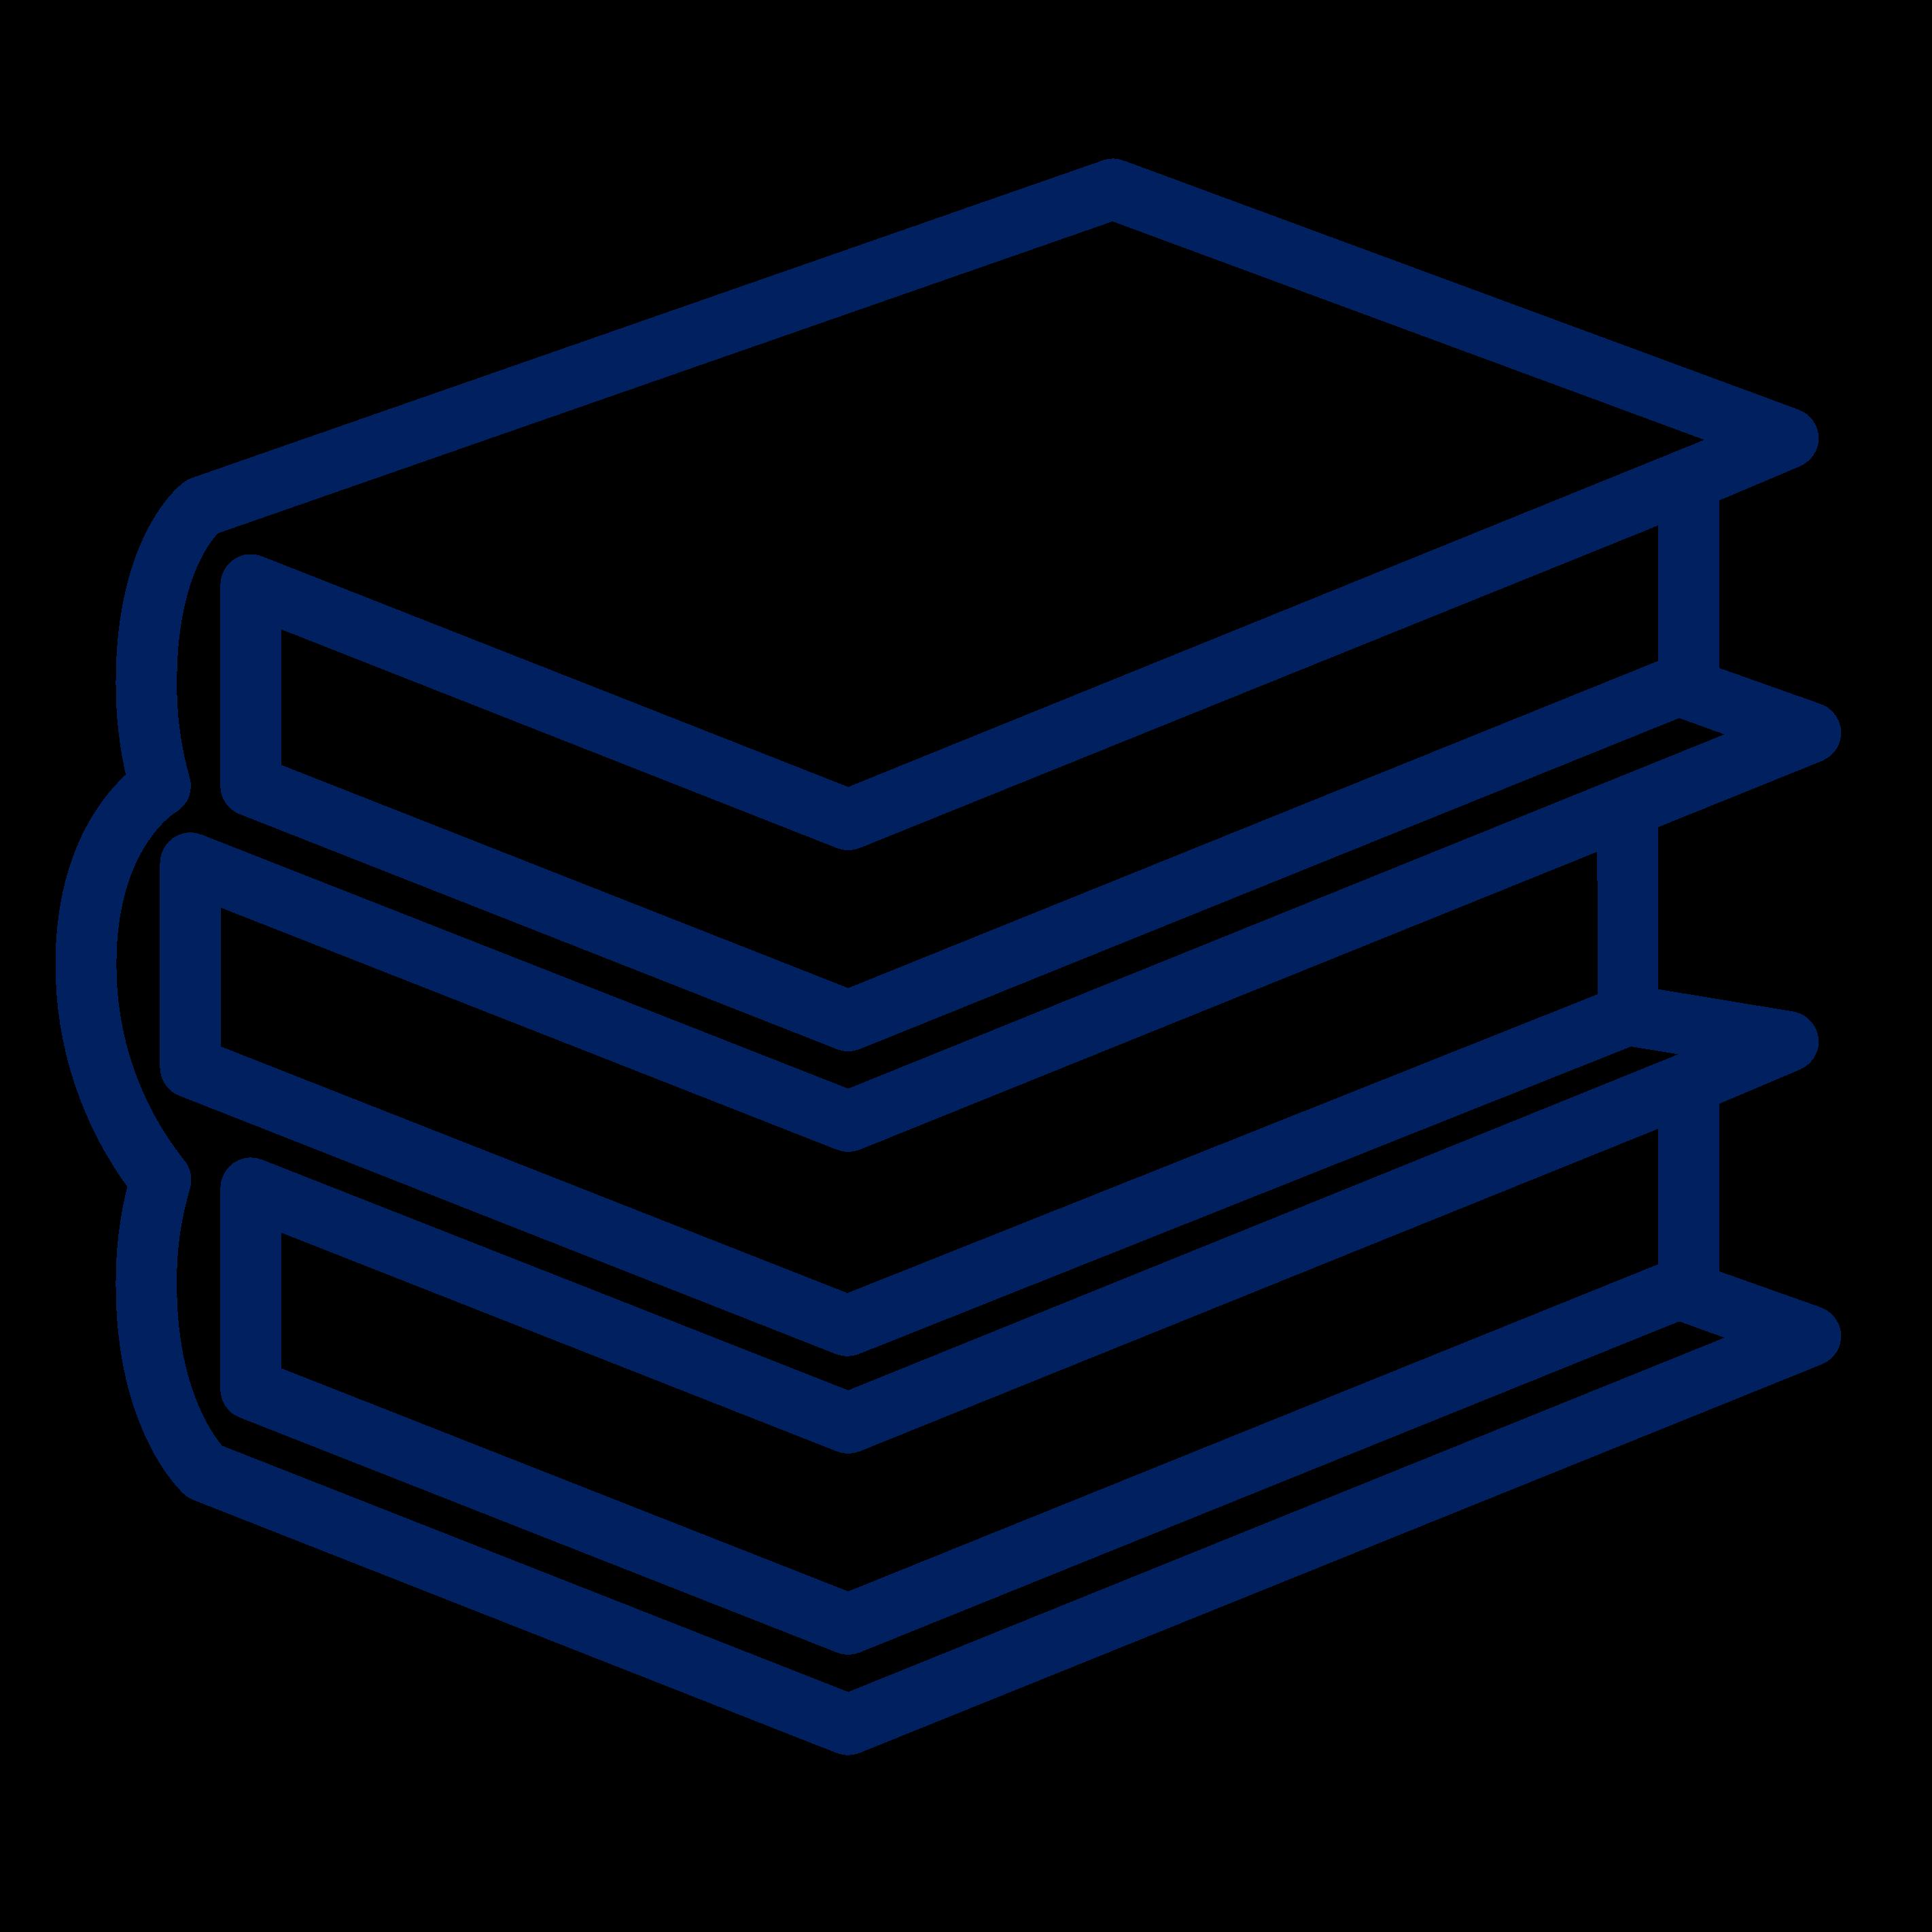 Icon - pile of books